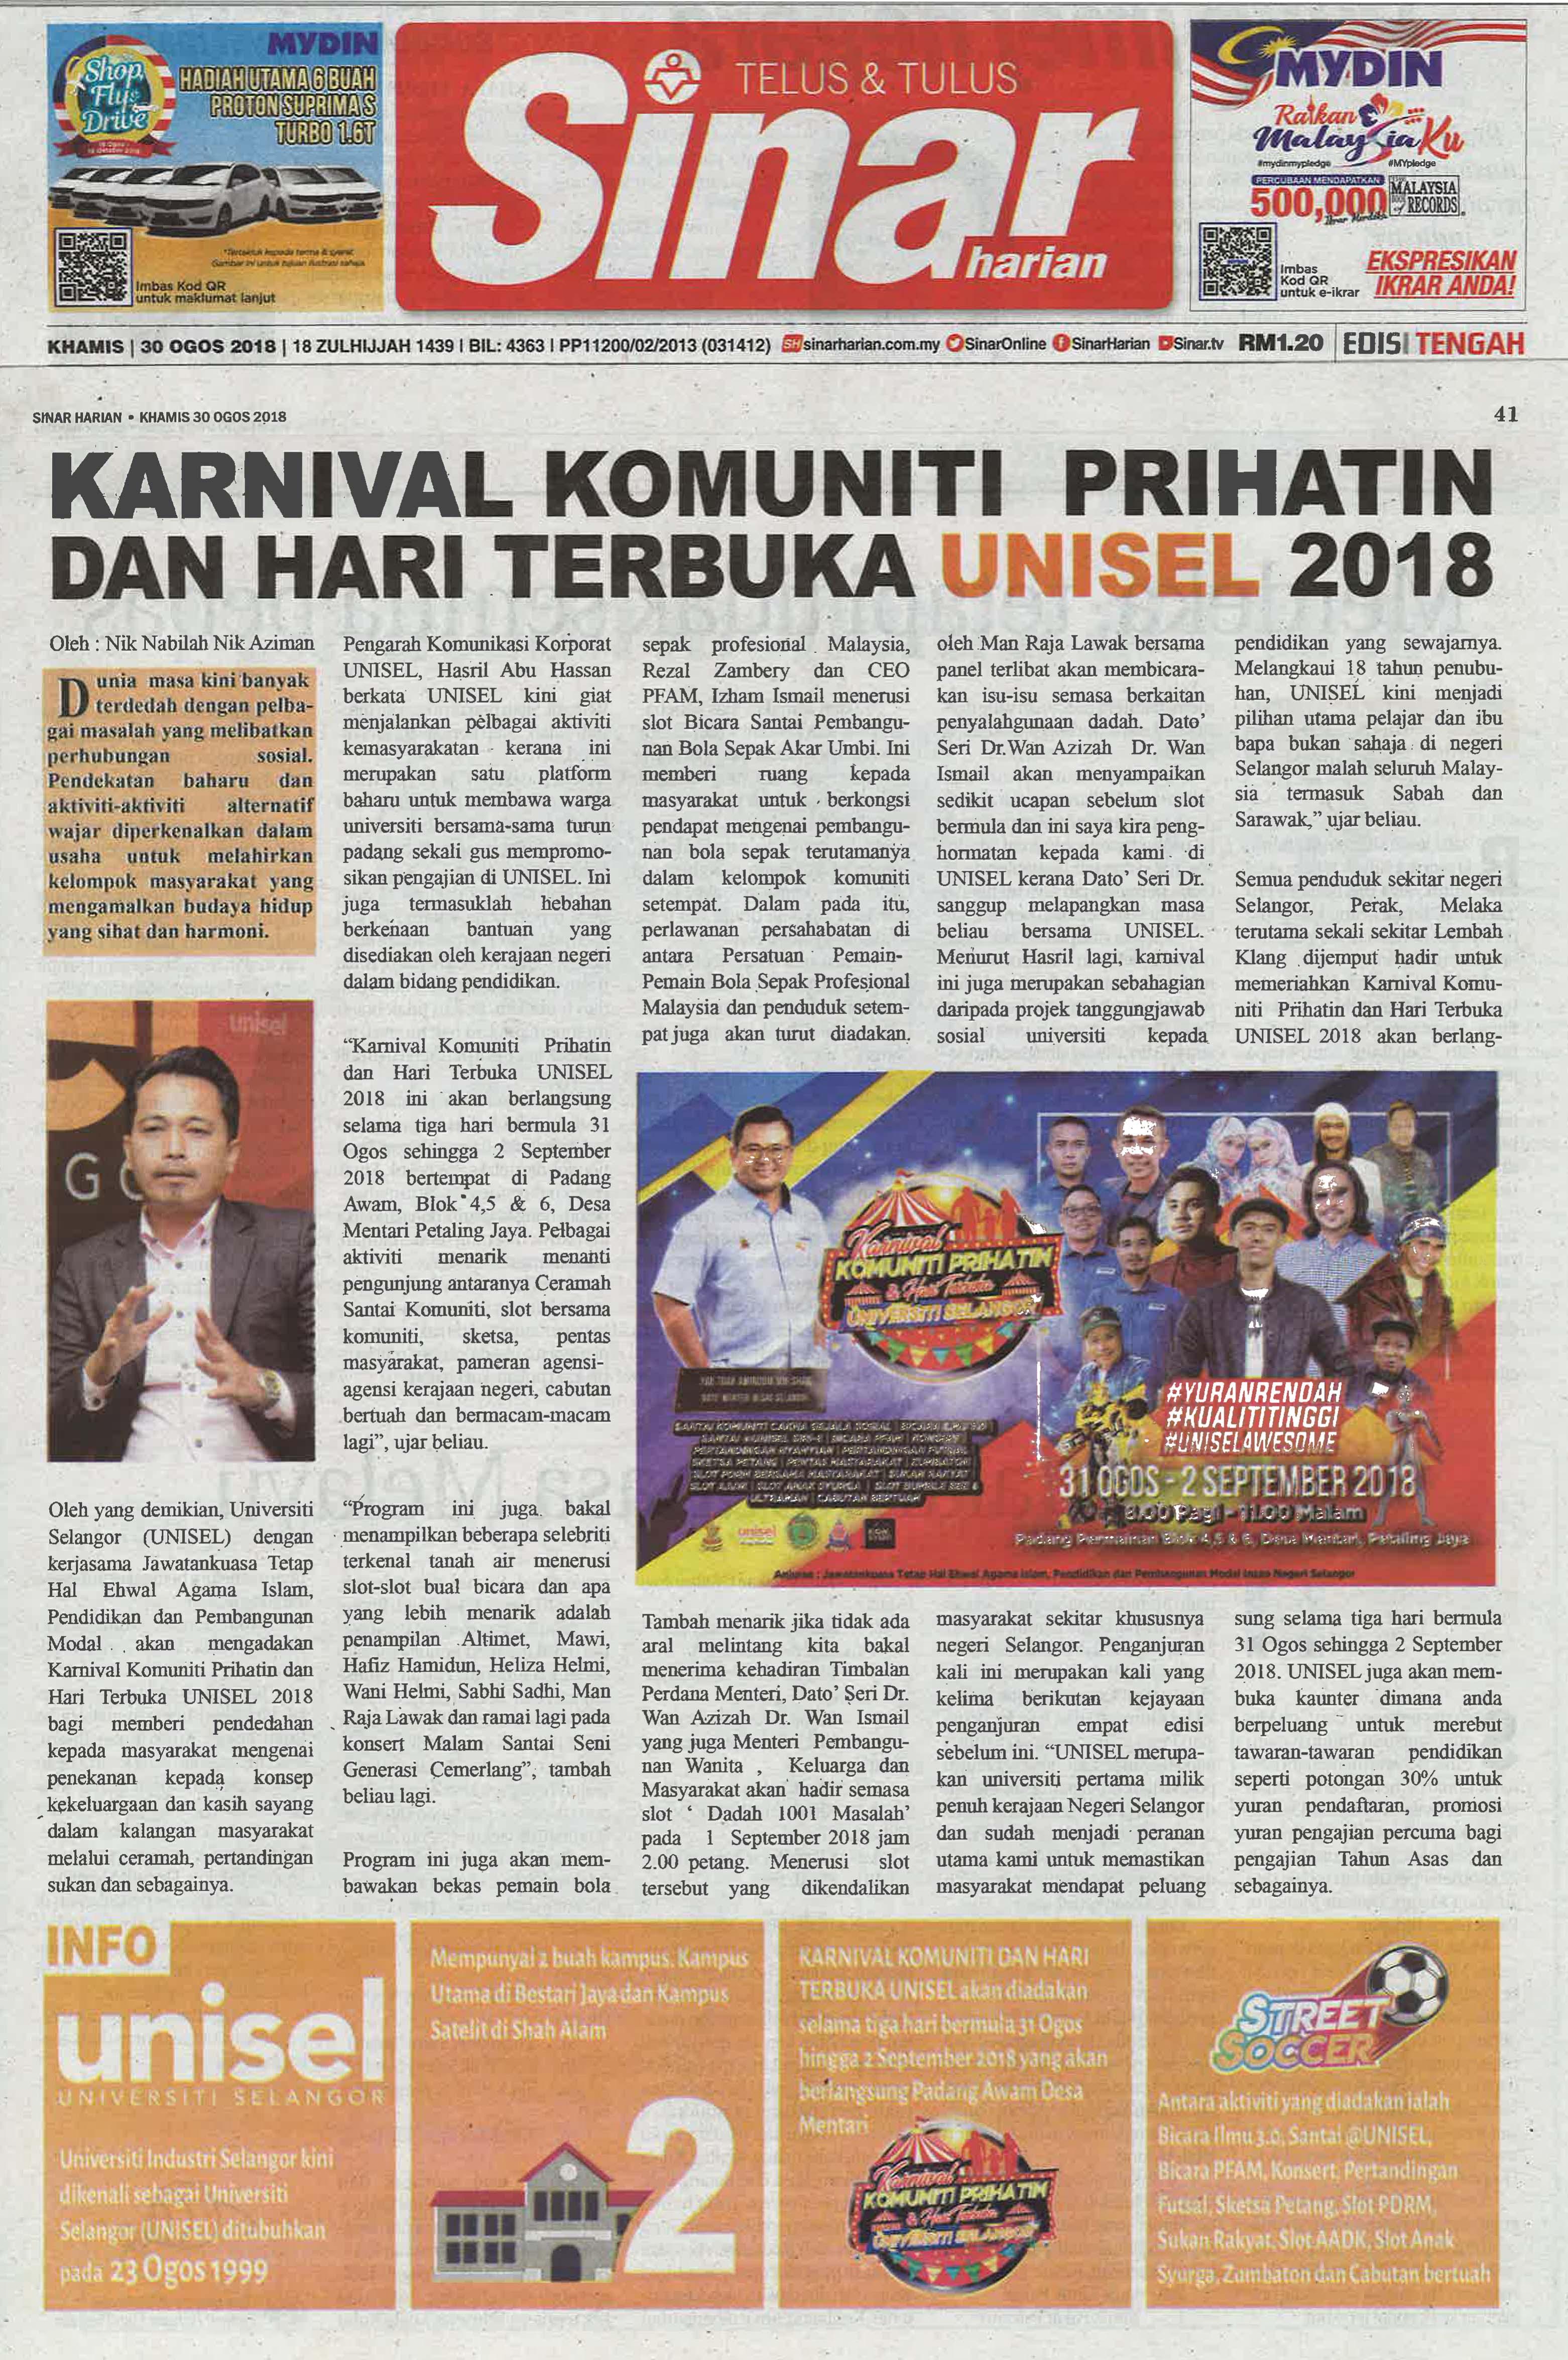 Sinar Harian - 30 Ogos 2018